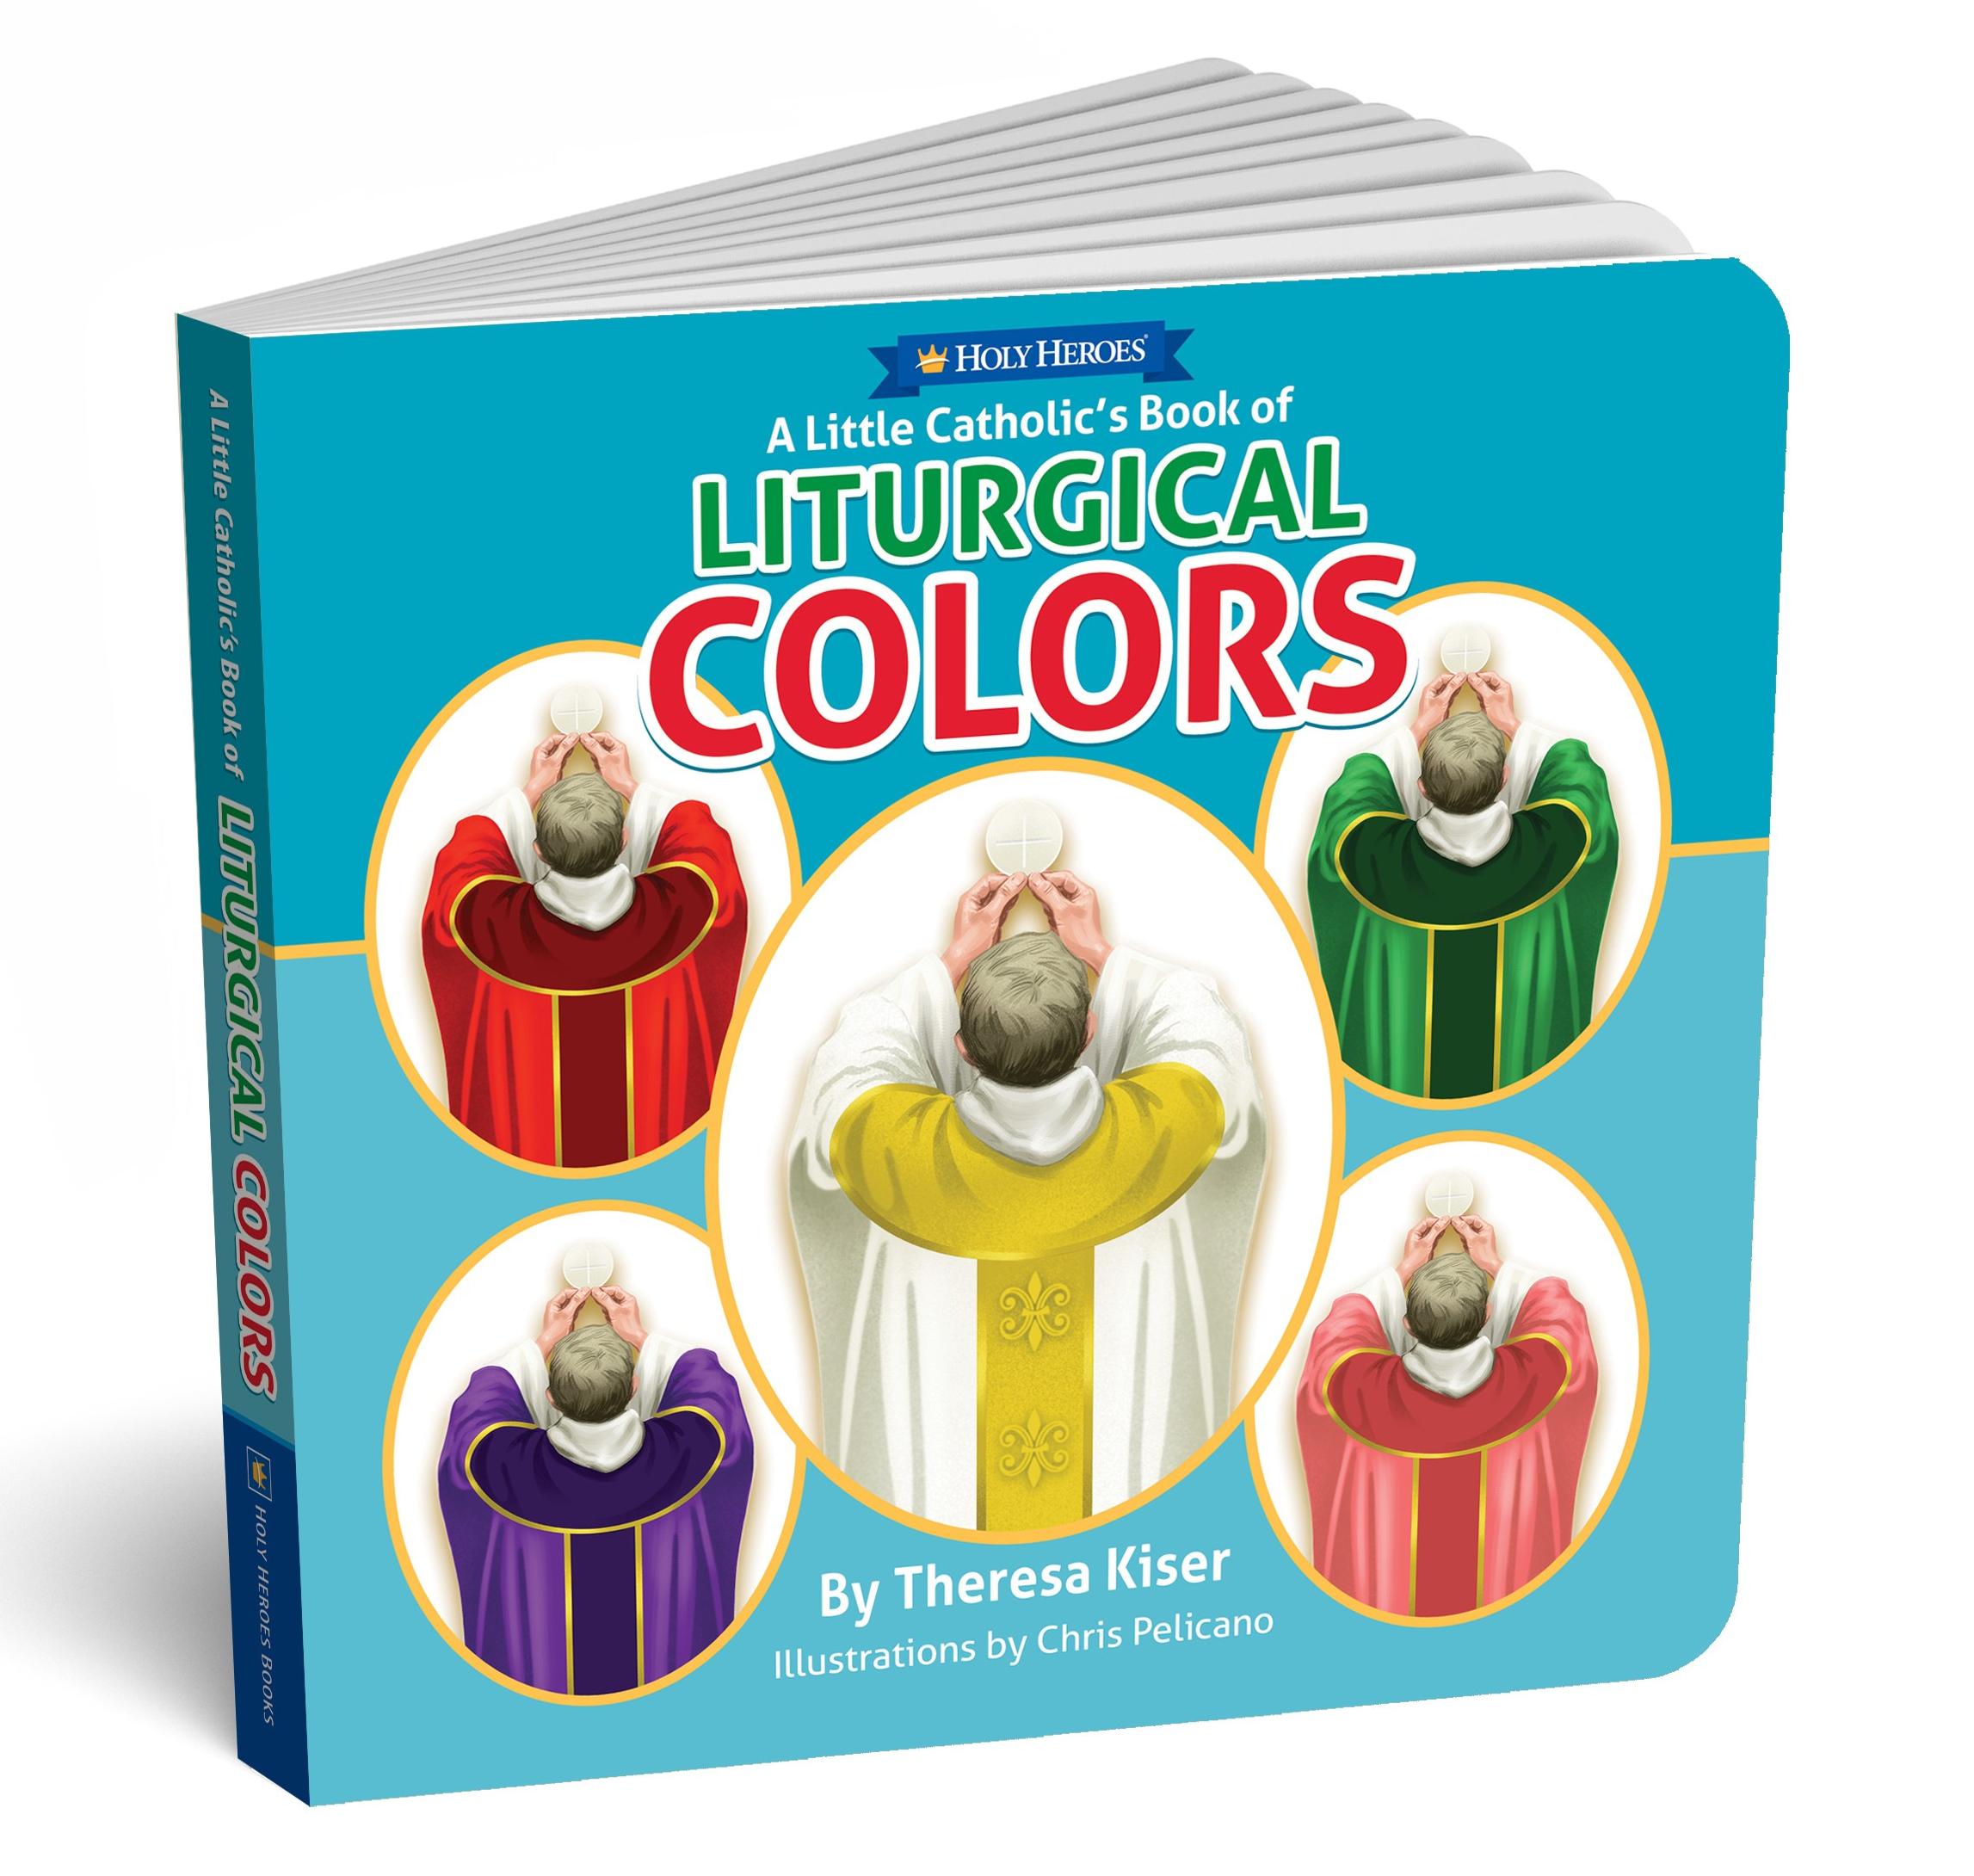 HH LiturgicalColors-Mockup1